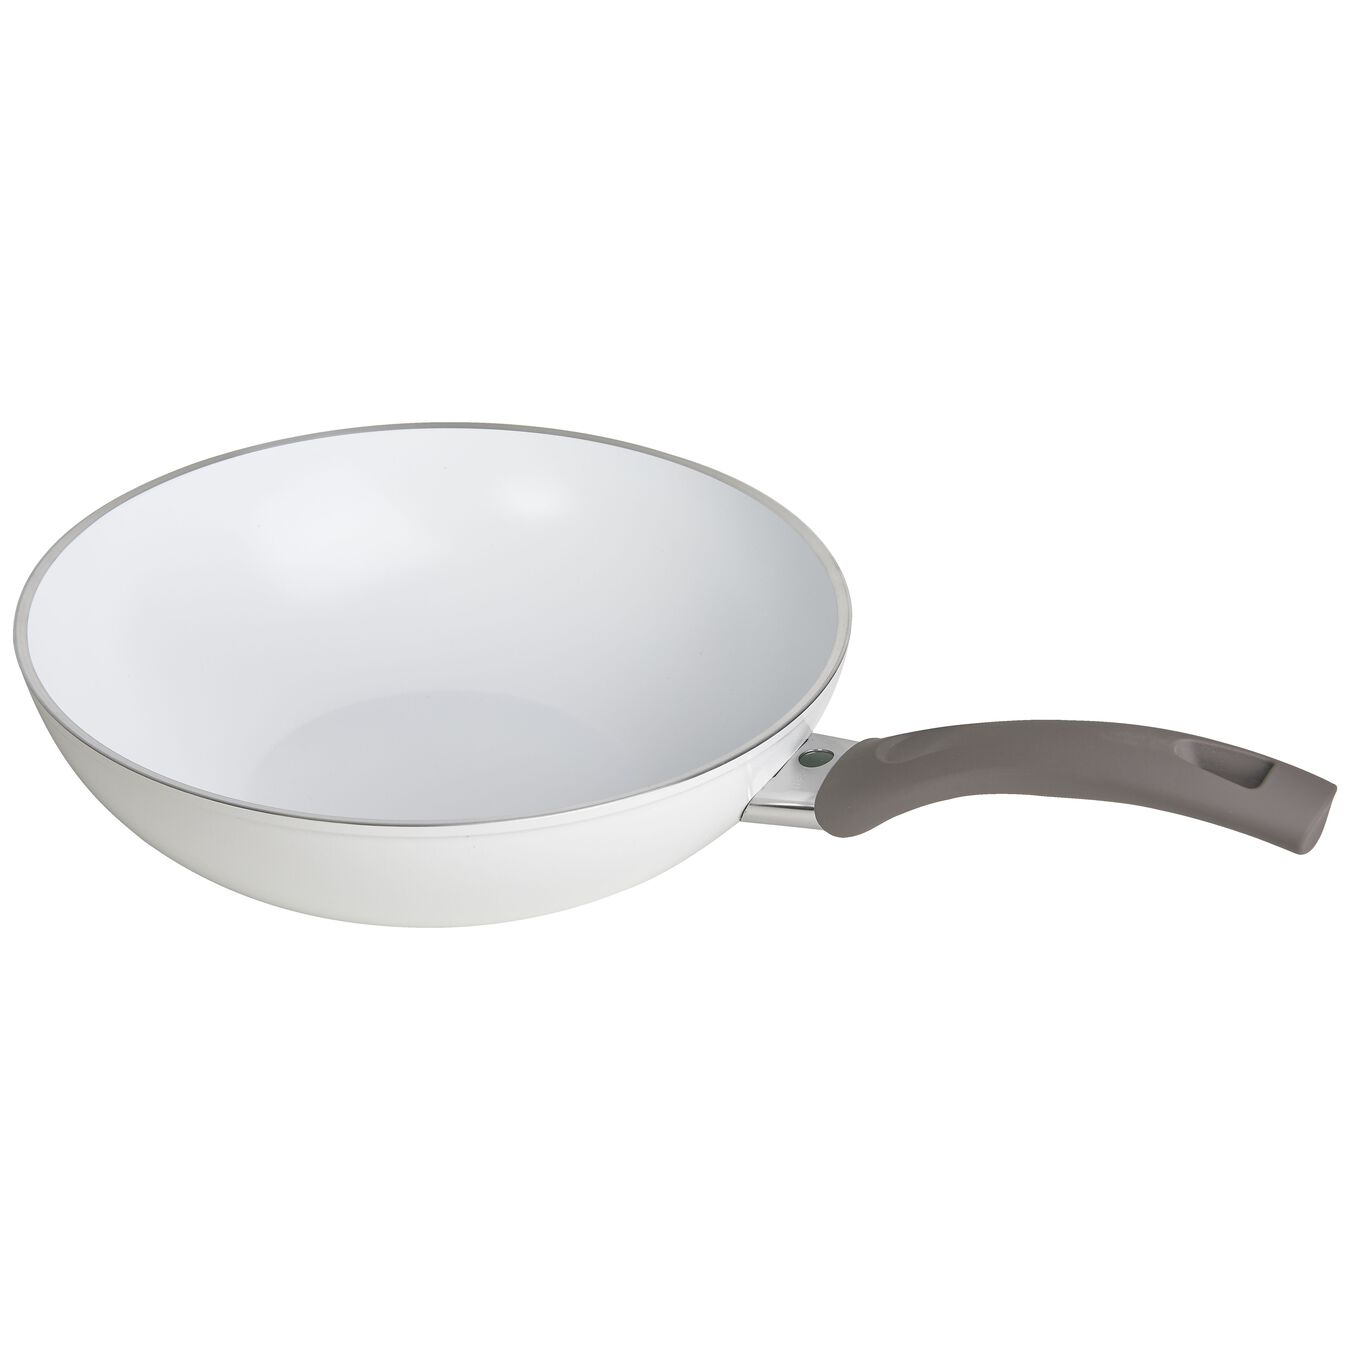 Wok/Gemüse/Pastapfanne 28 cm, Aluminium,,large 1